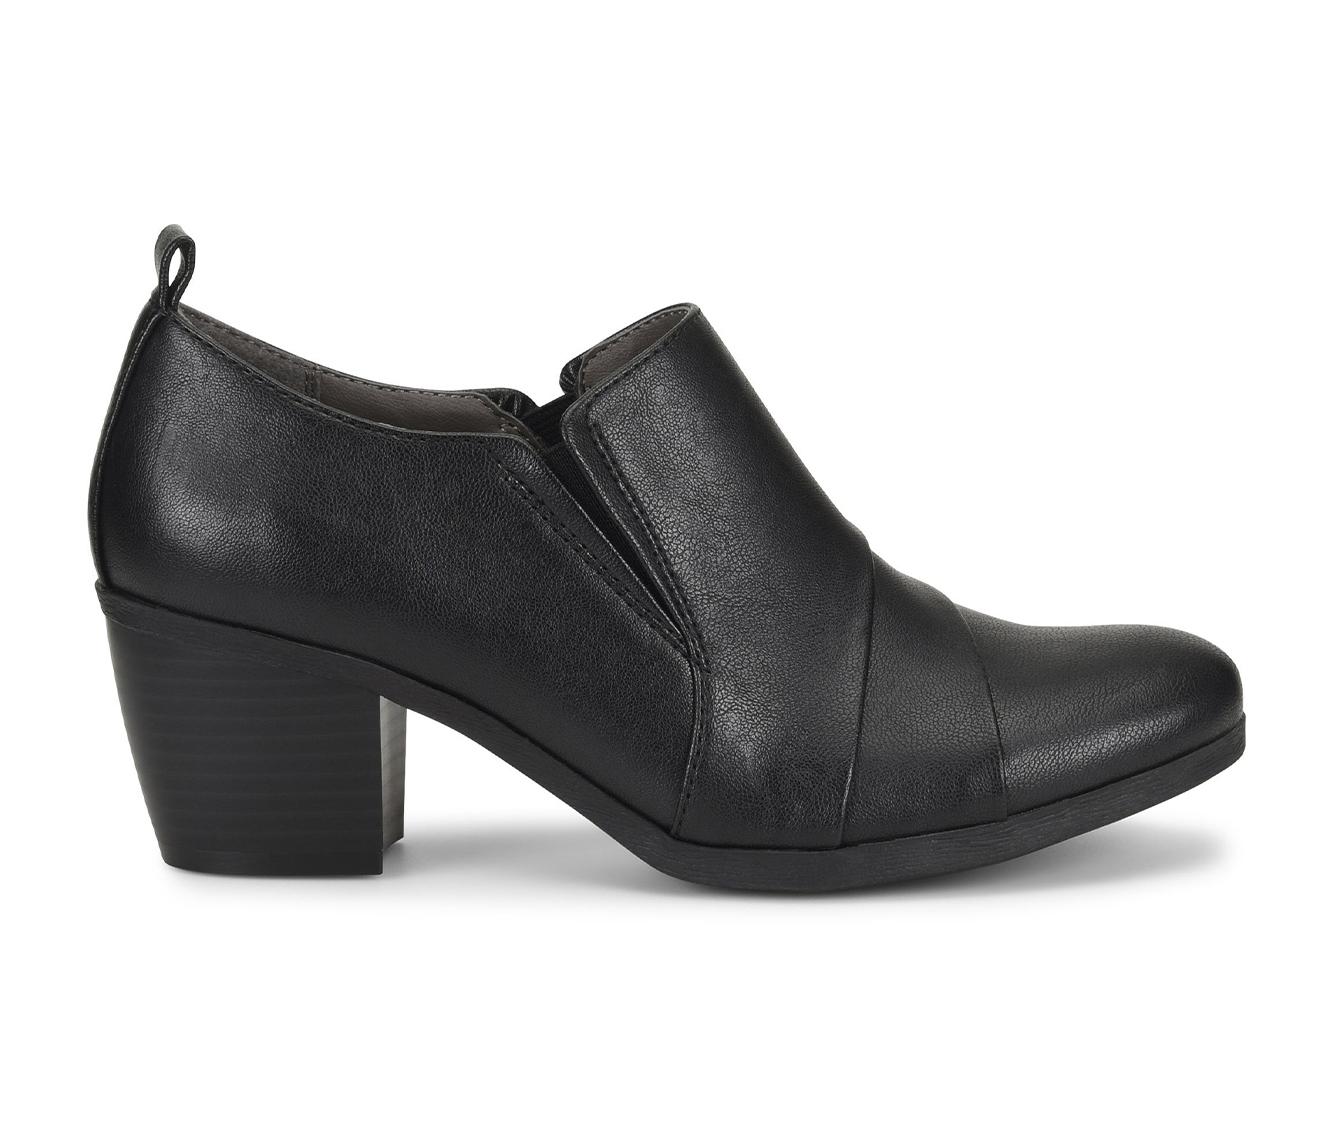 EuroSoft Ashby Women's Shoe (Black Faux Leather)